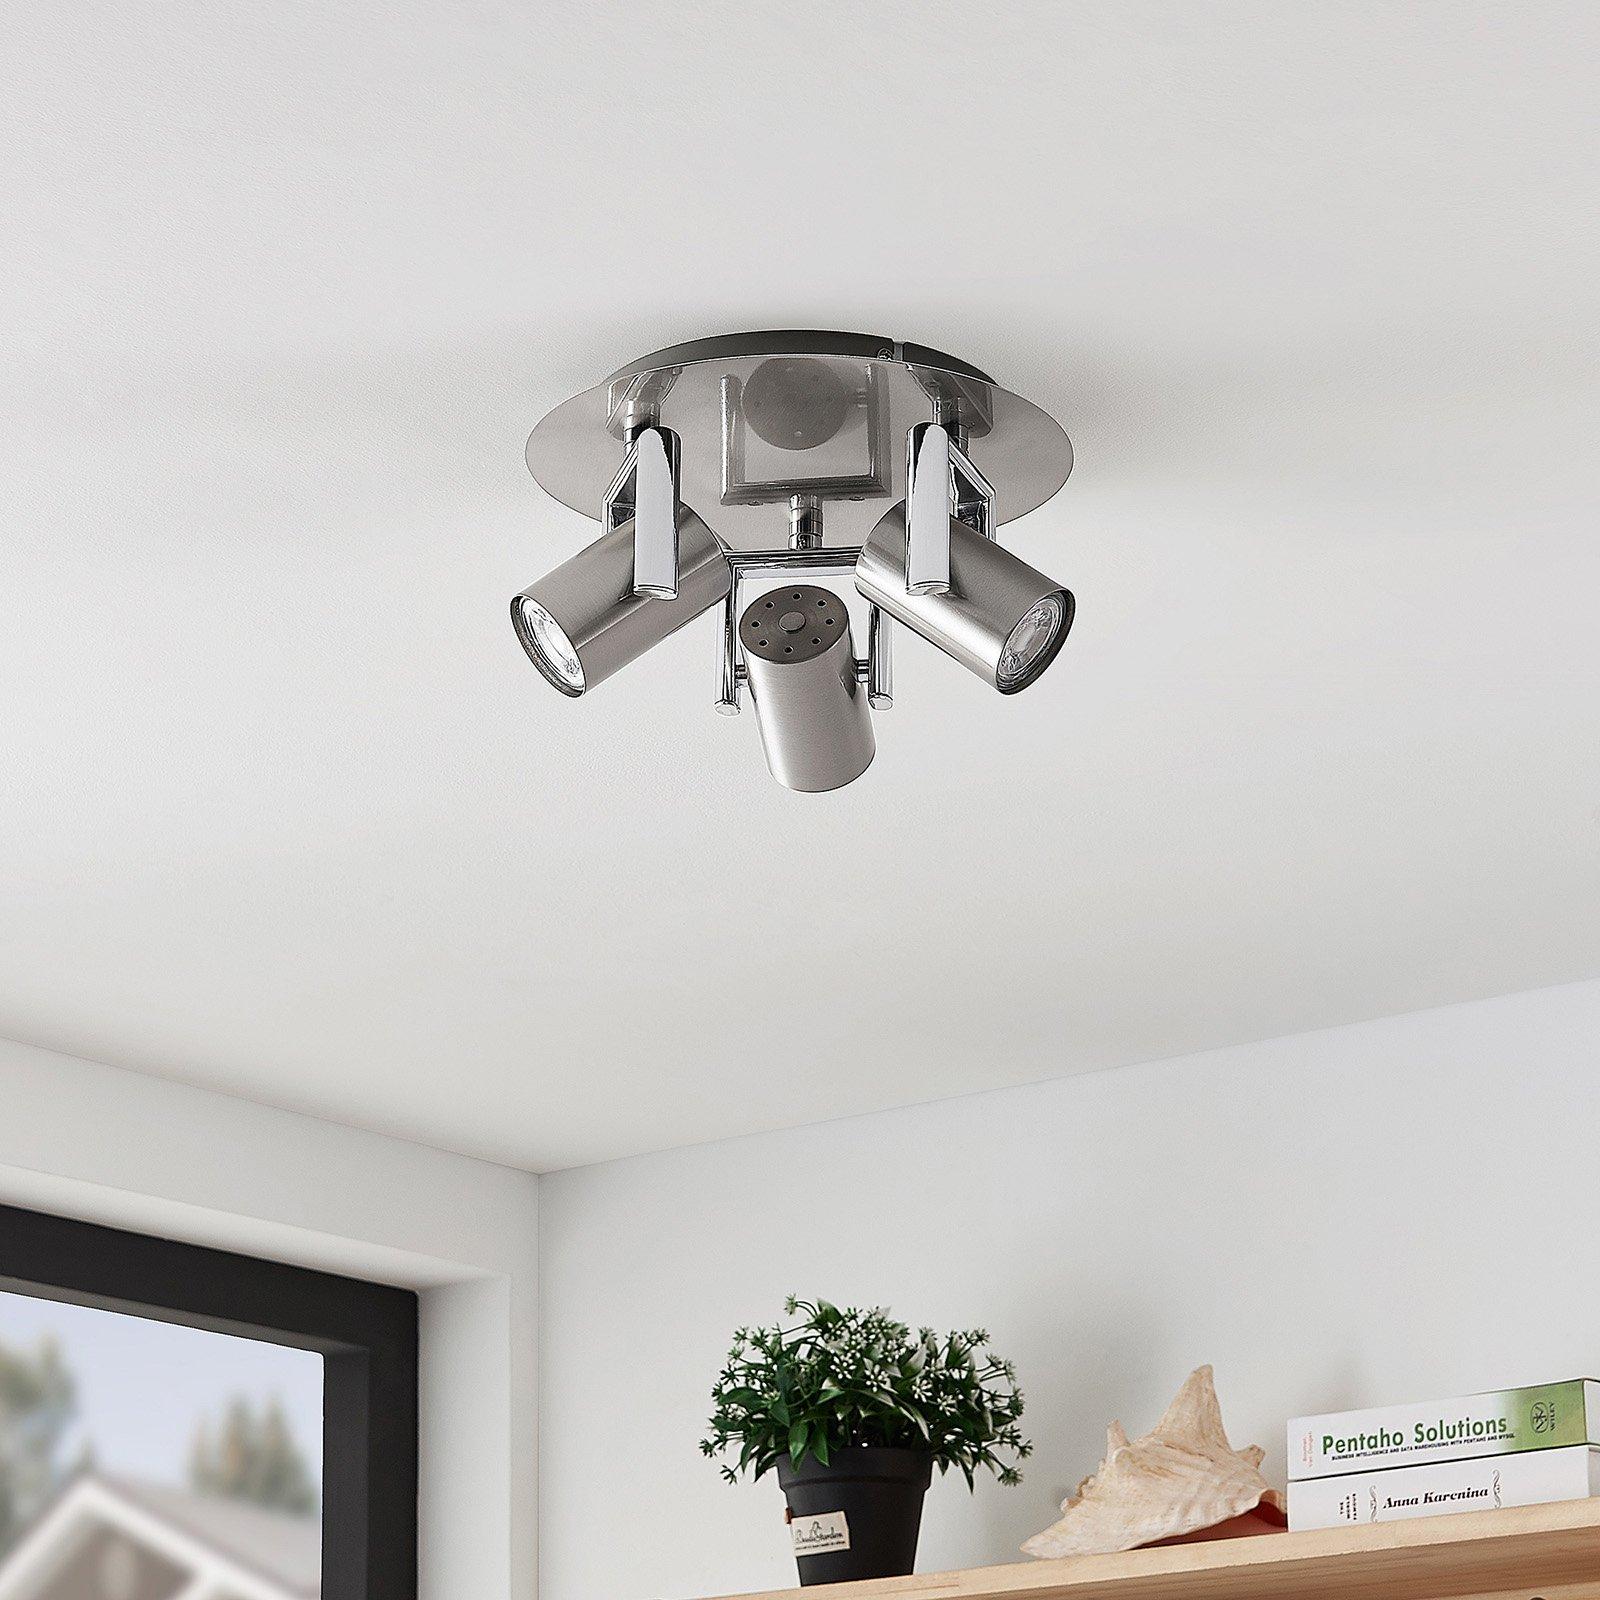 Lindby Reina taklampe, nikkel, 3 lyskilder, rund